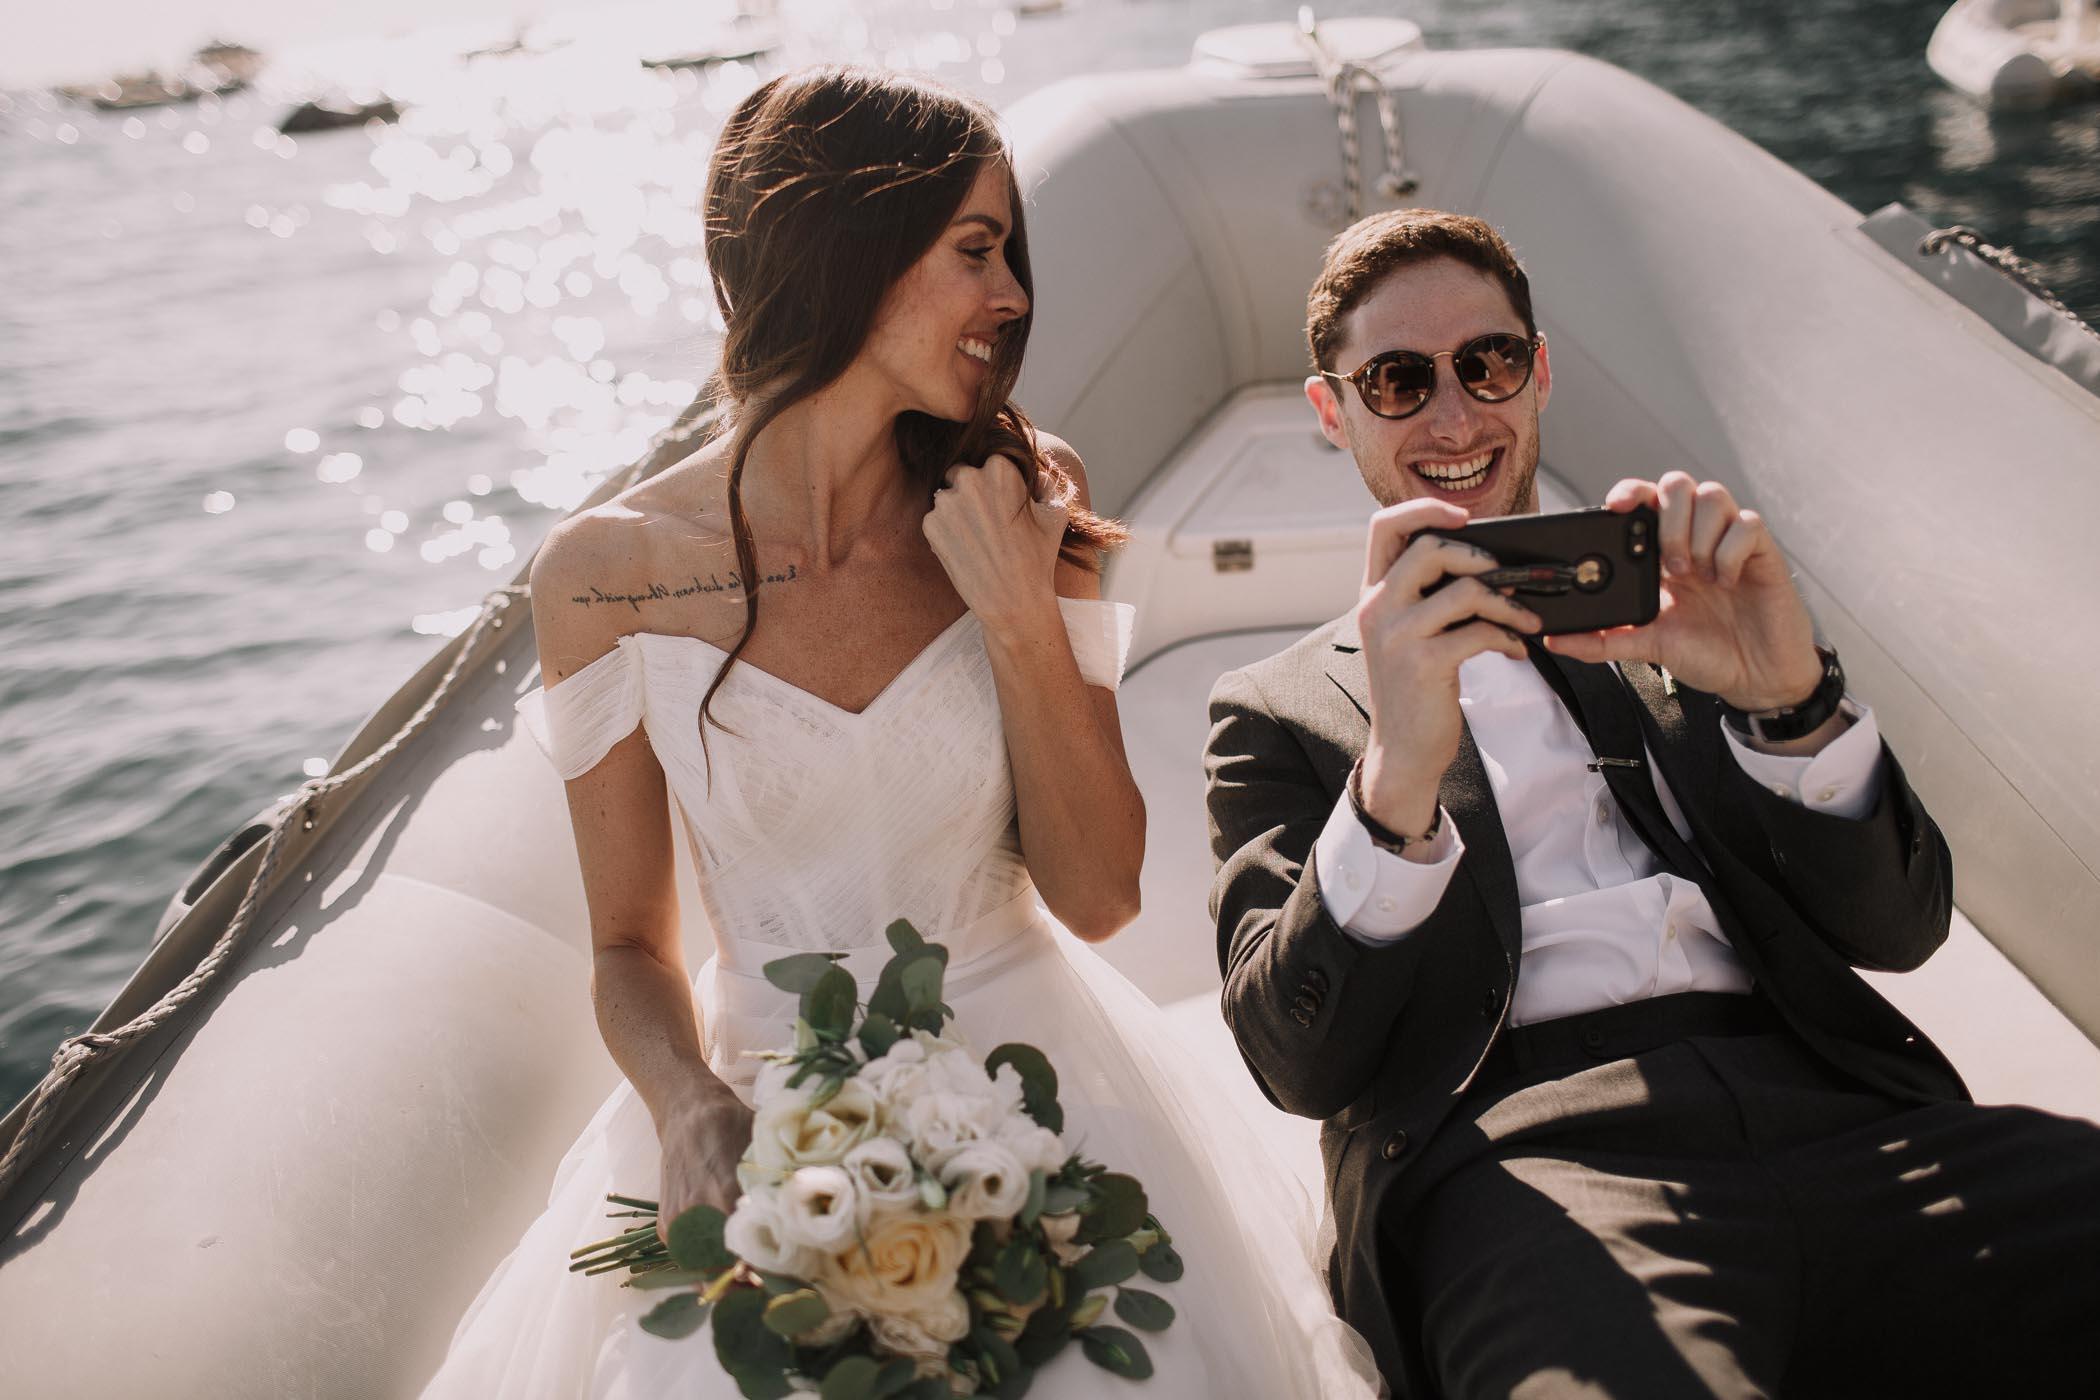 Photographe-mariage-bordeaux-jeremy-boyer-15.jpg